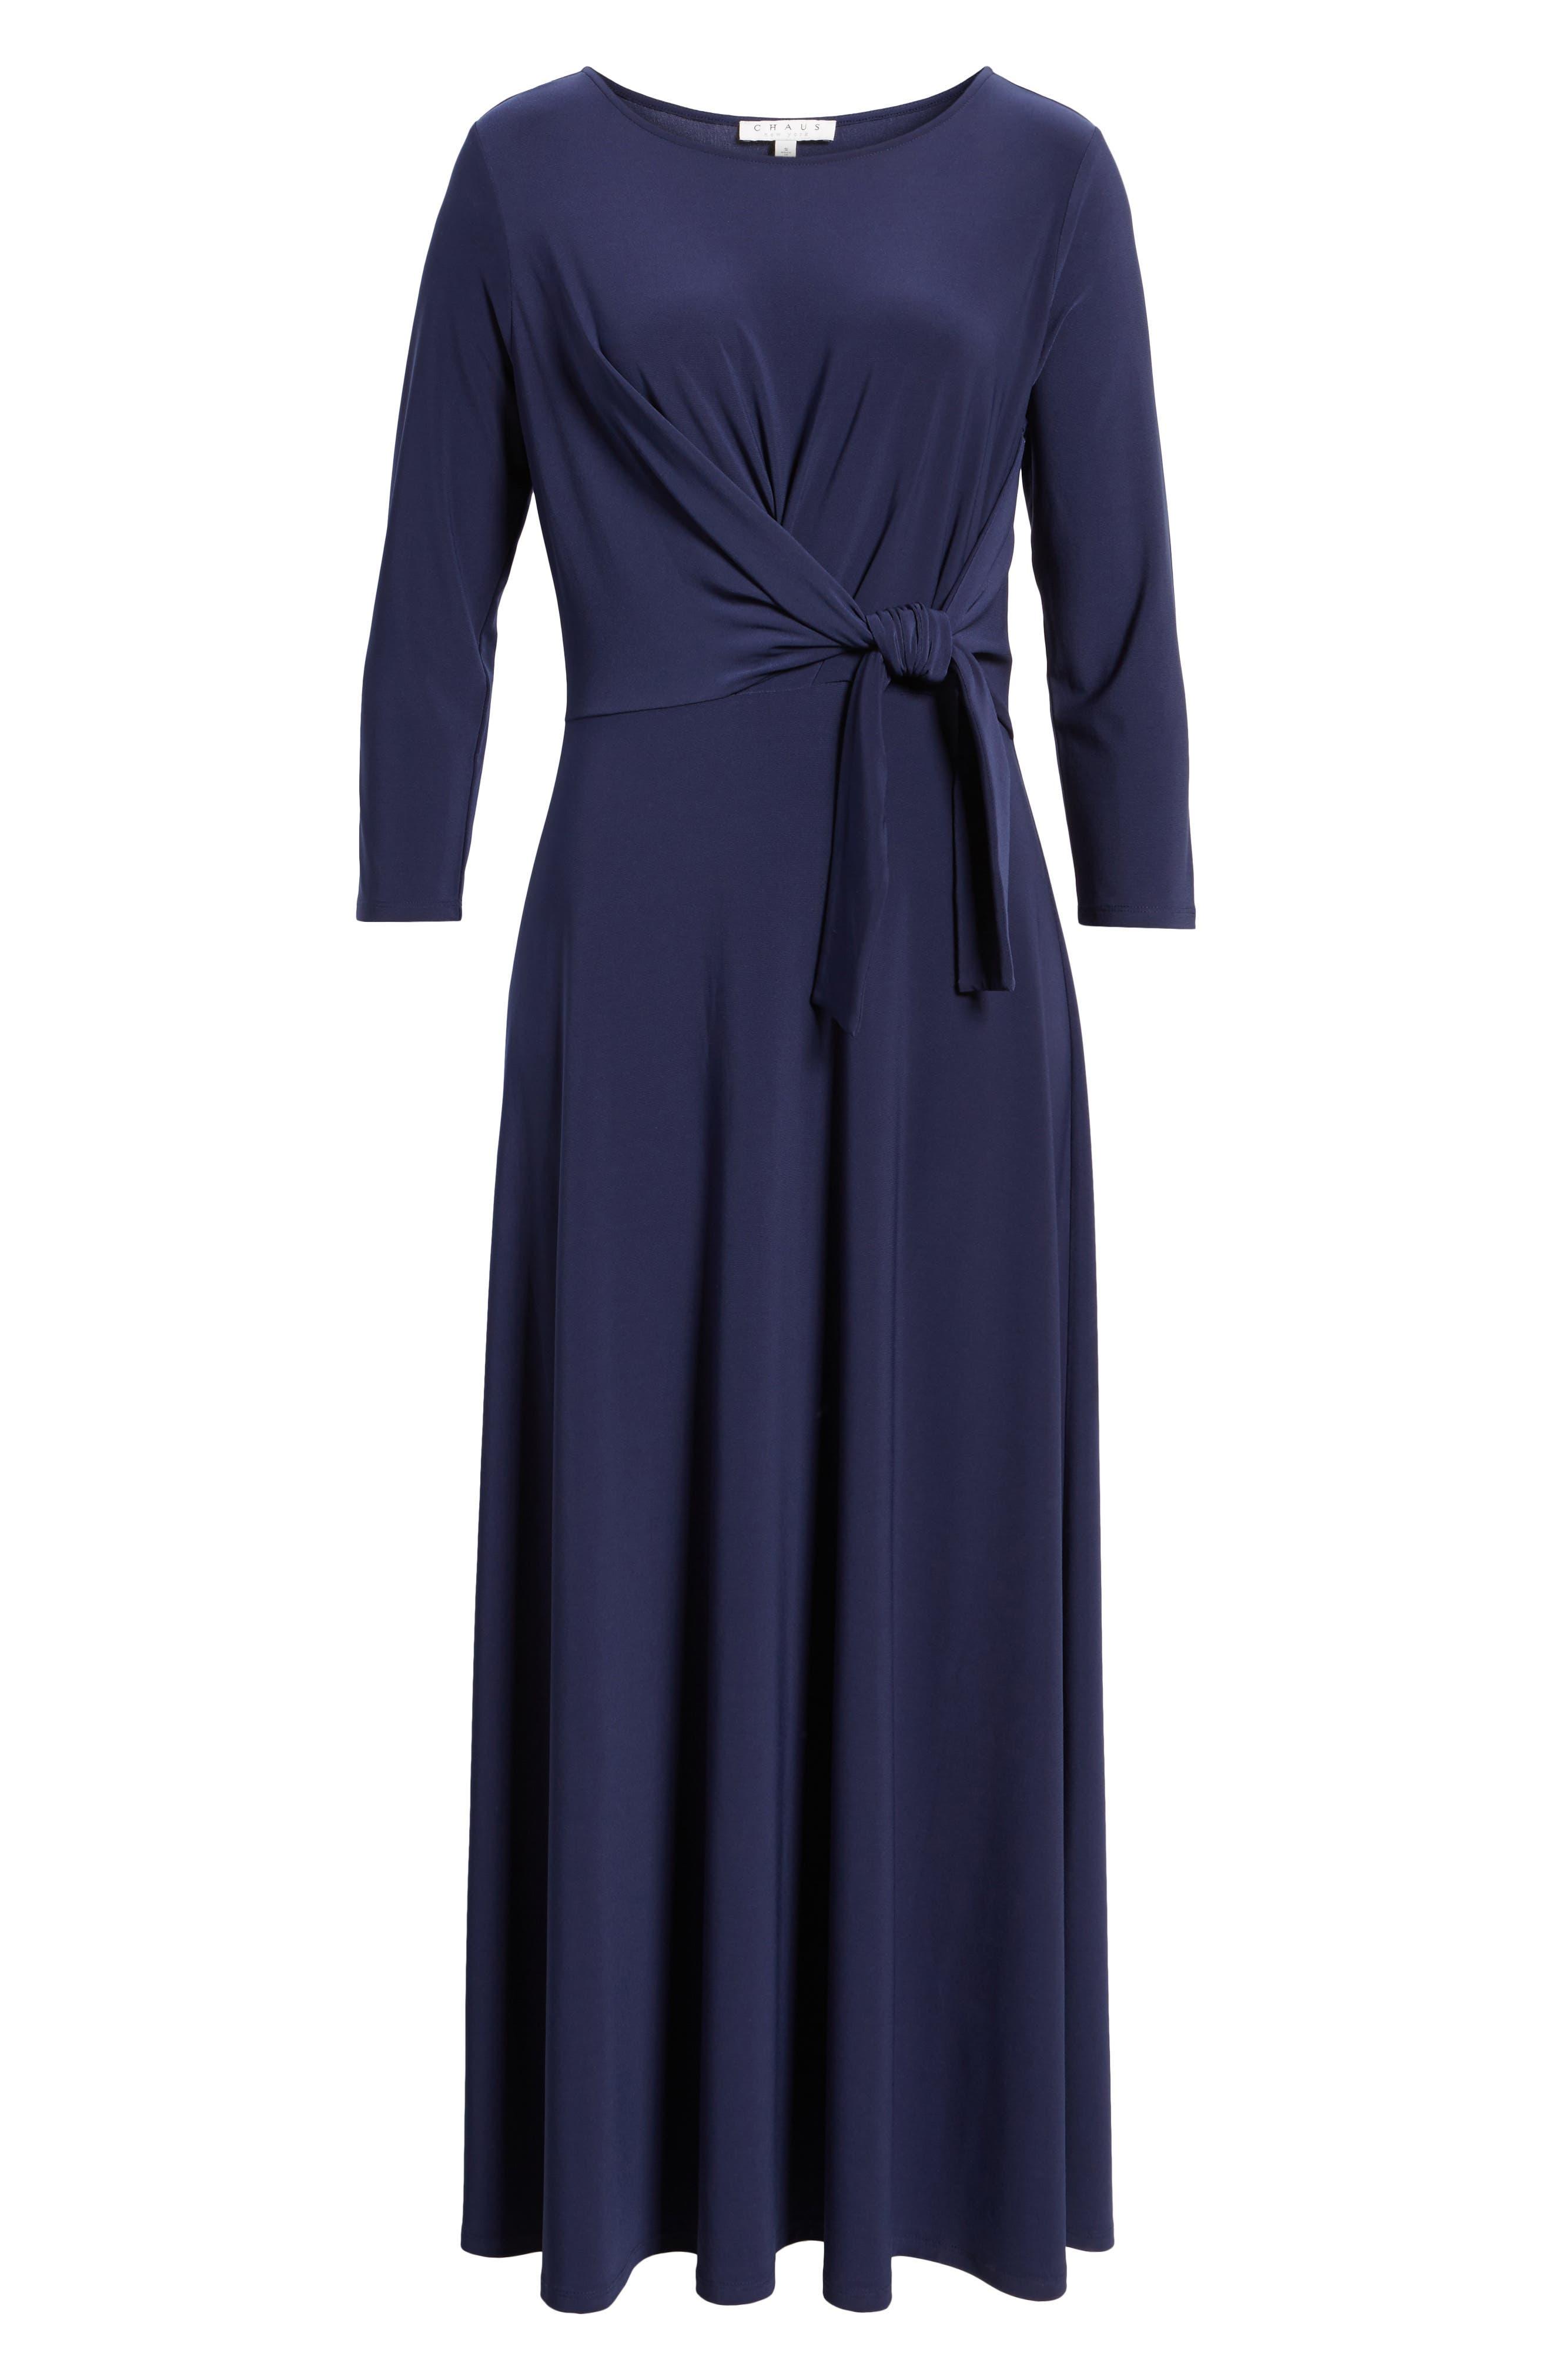 Cahus Faux Wrap Midi Dress,                             Alternate thumbnail 6, color,                             429